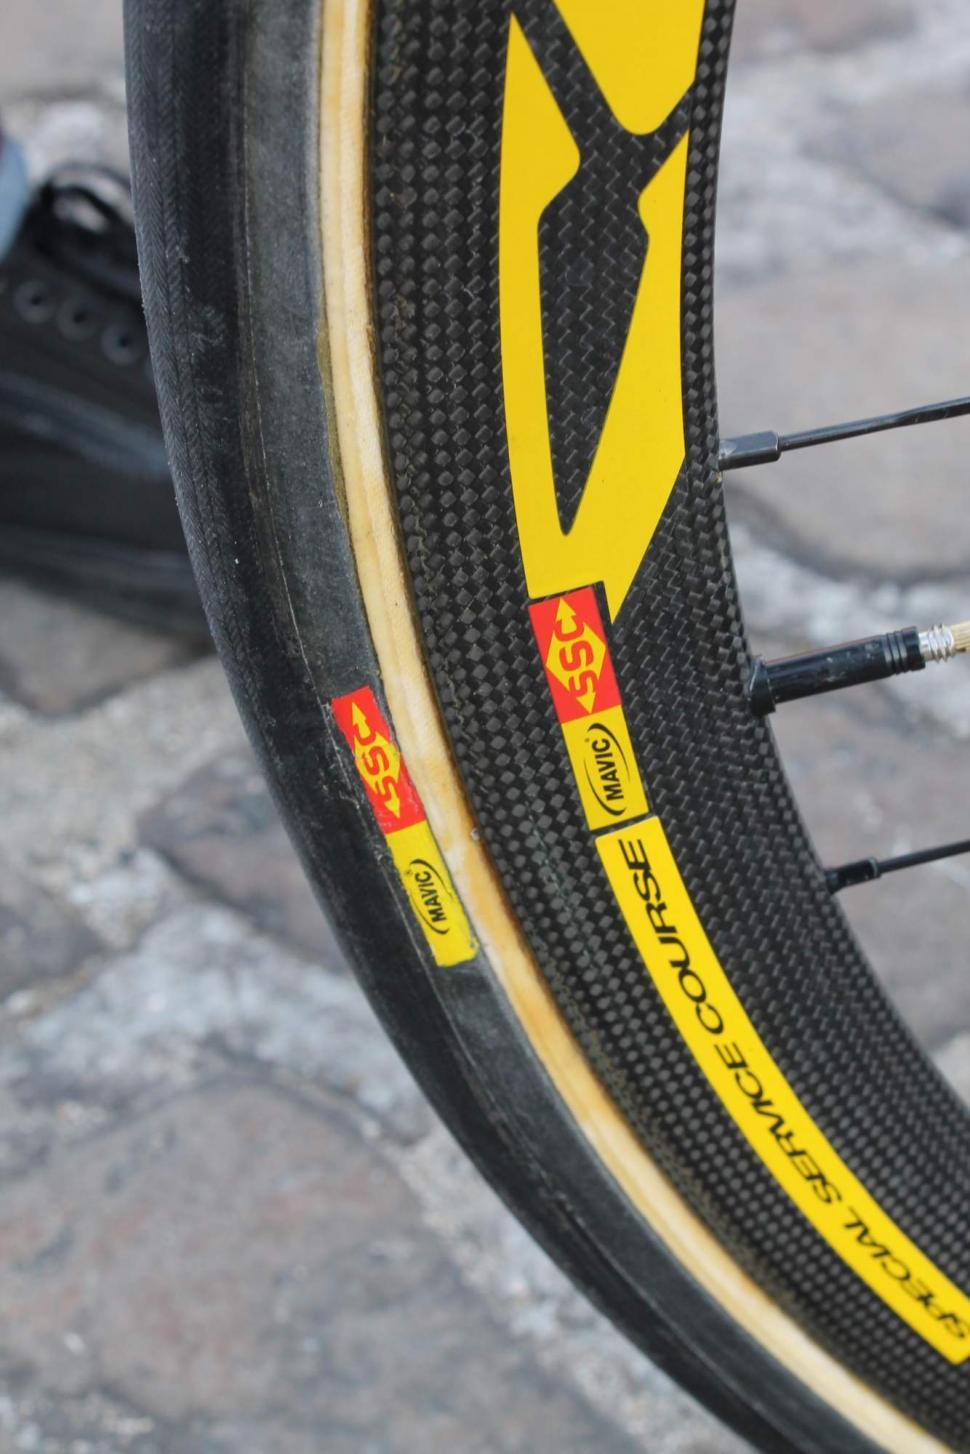 paris roubaix 2013 - Mavic wheels and tyres